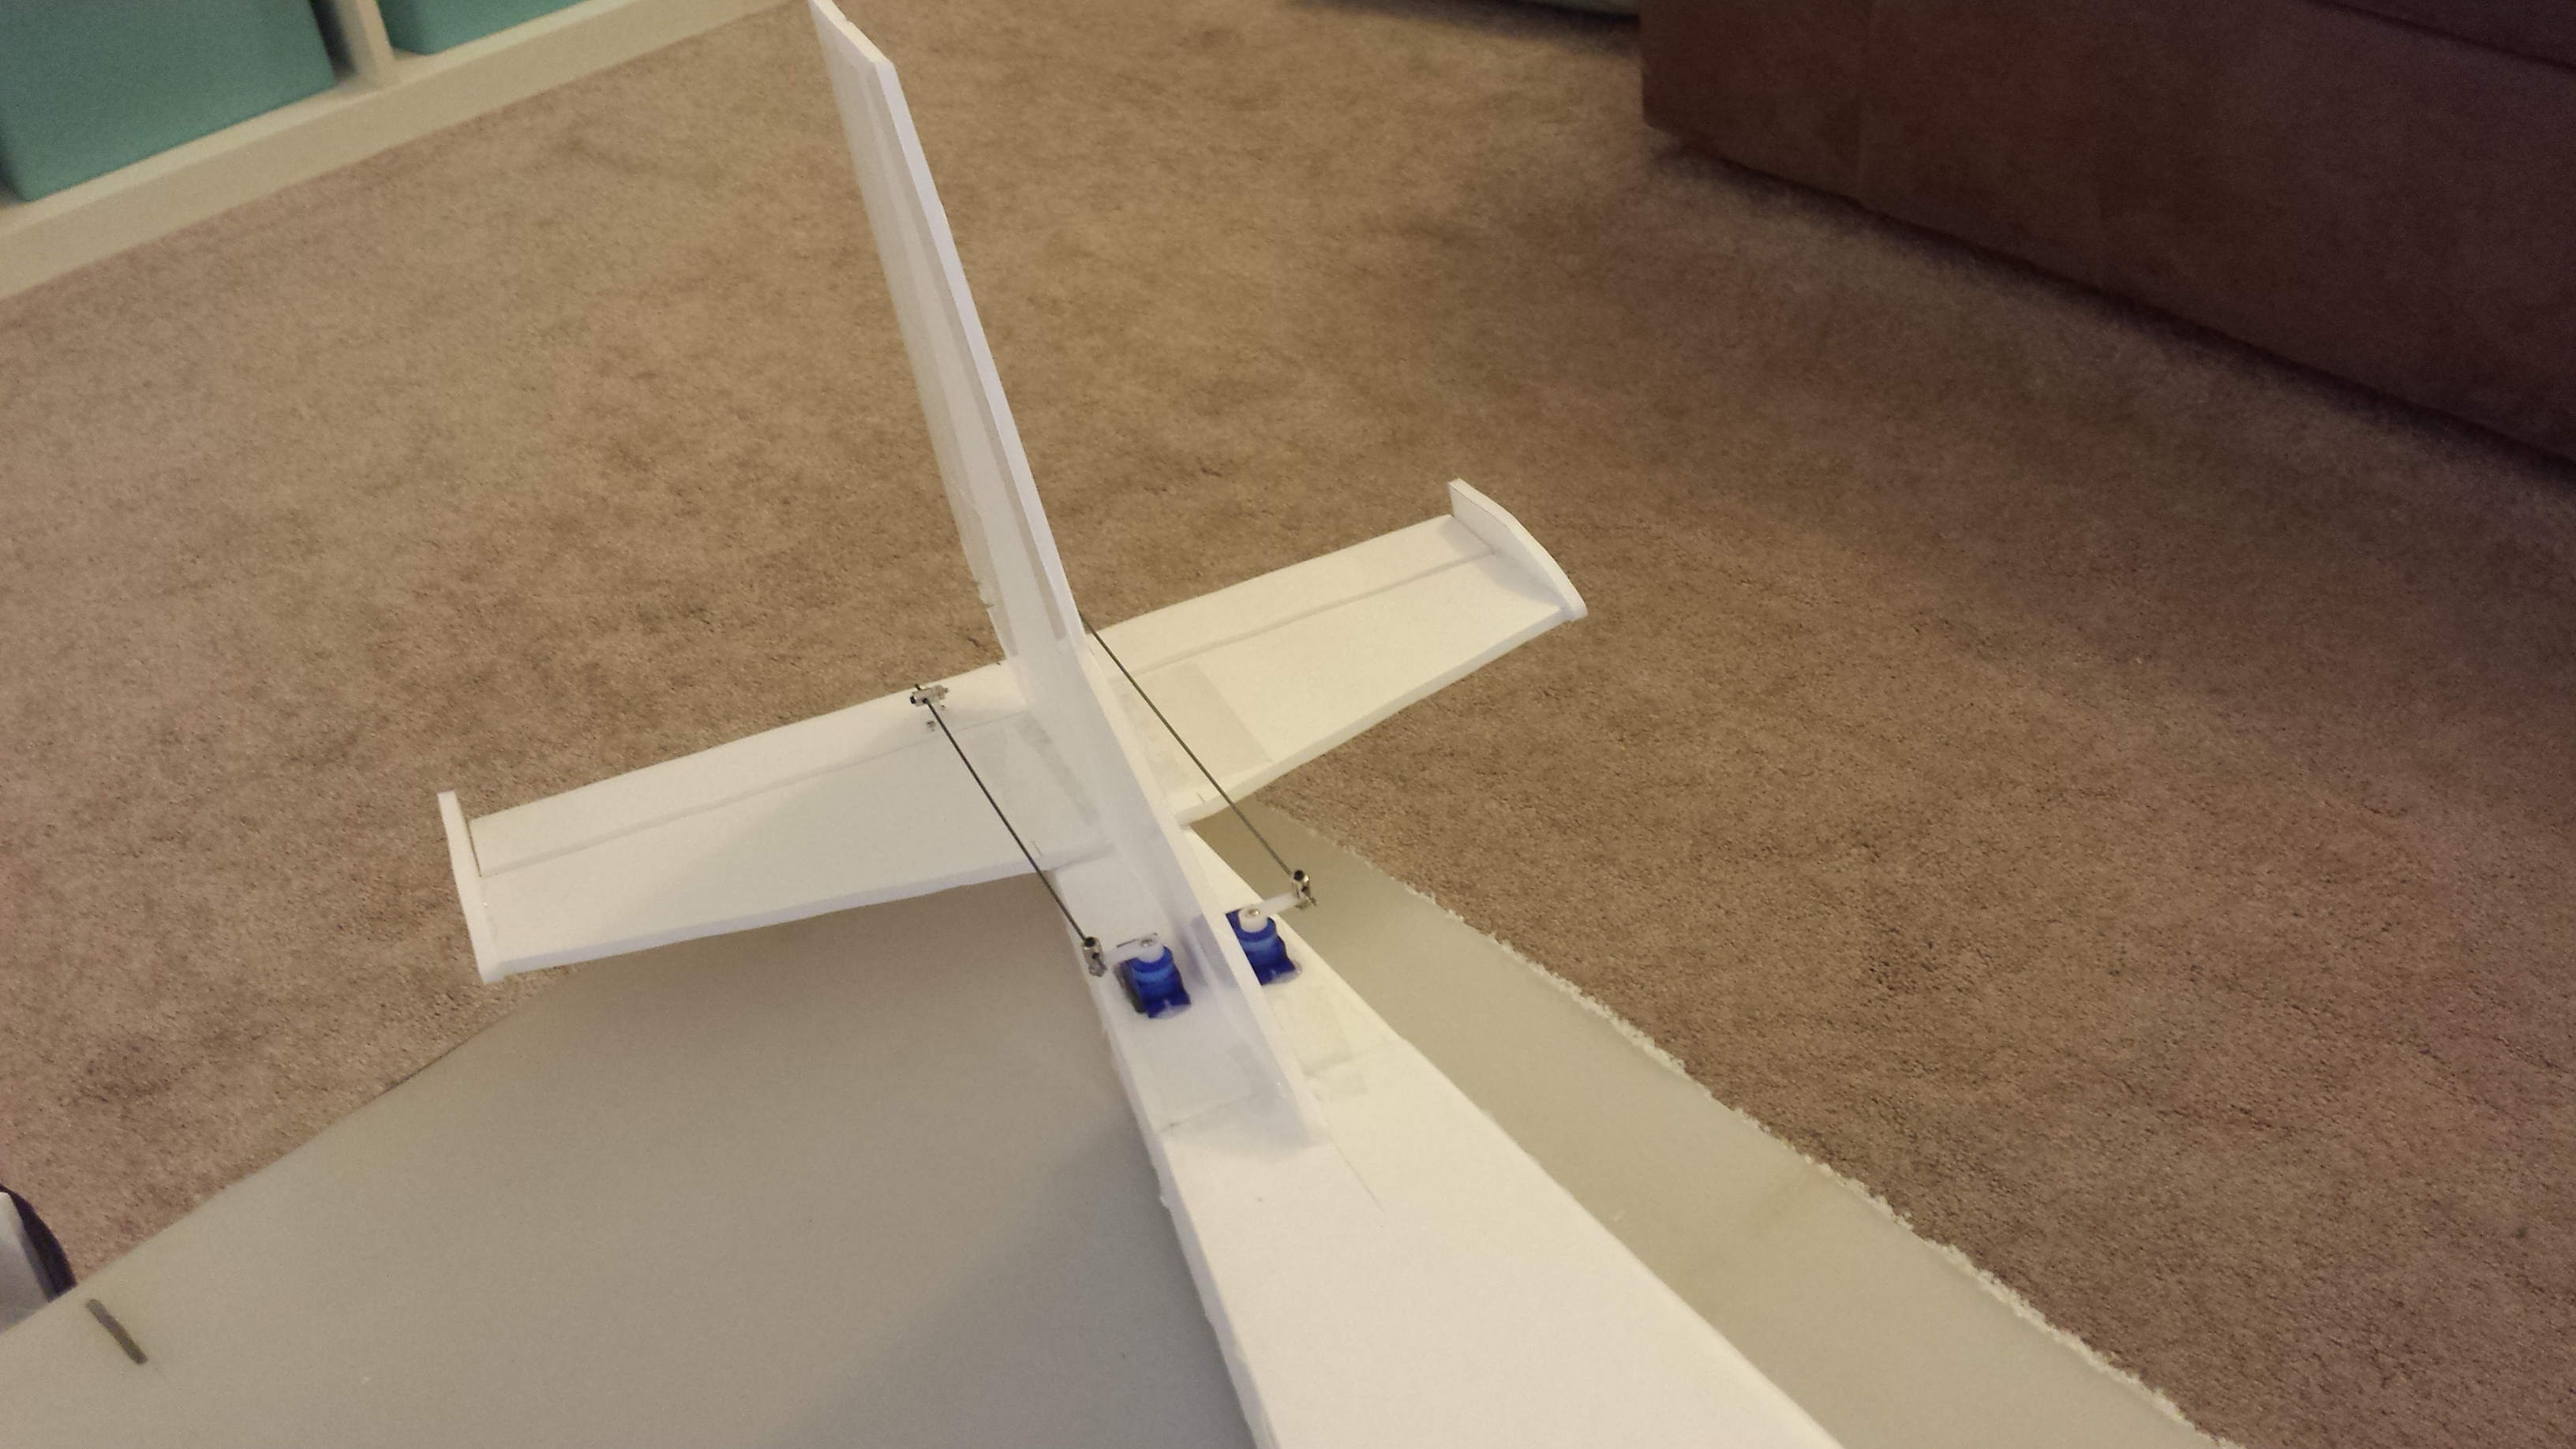 Click image for larger version.  Name:image-scissor-wing-transport-300-600-105611133124226.jpg Views:20 Size:29.3 KB ID:77974